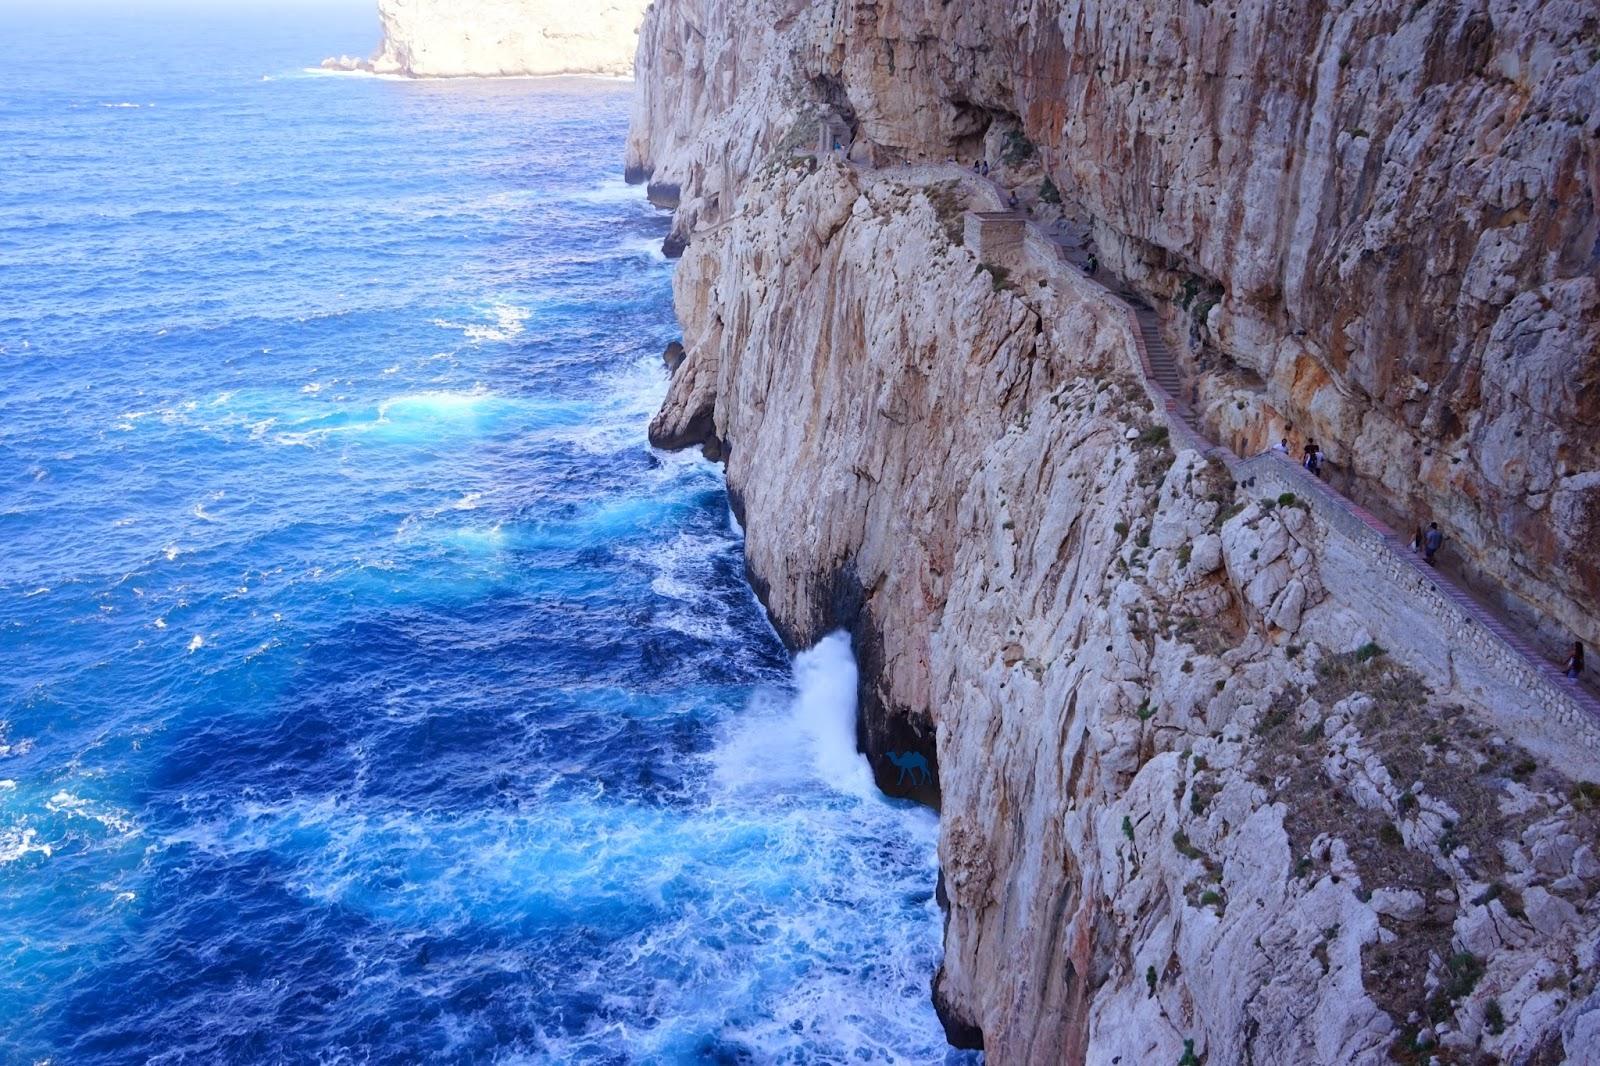 Le Chameau Bleu - Blog Voyage Sardaigne - Chemin d 'accès a la grotte de Neptune Sardaigne - Grotto di nettuno